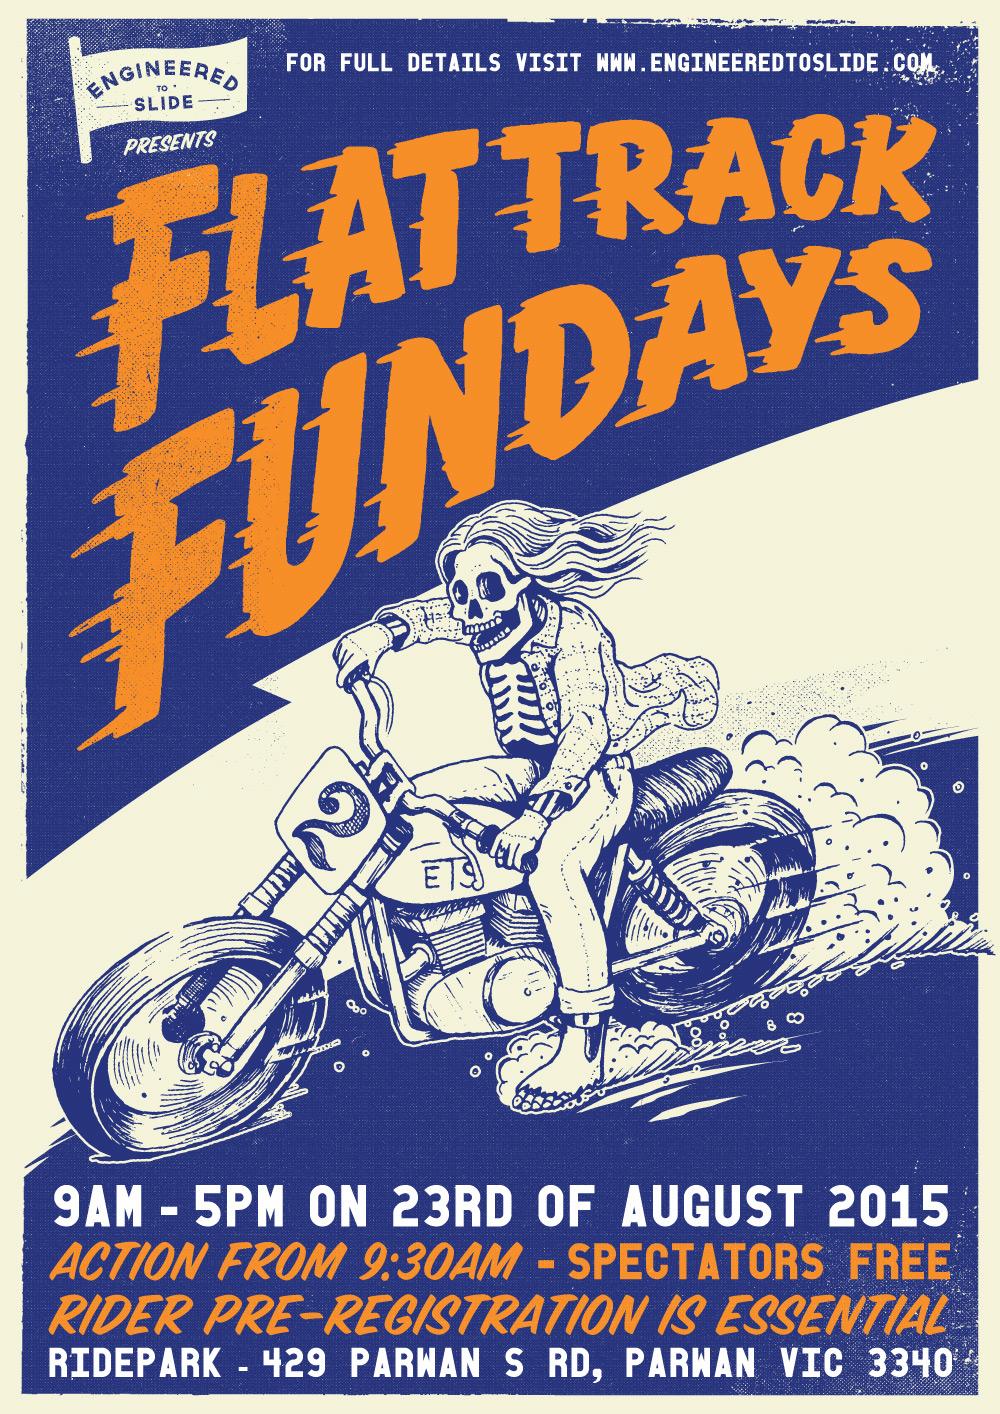 ETS_FlatTrackFundays_Poster_WEB